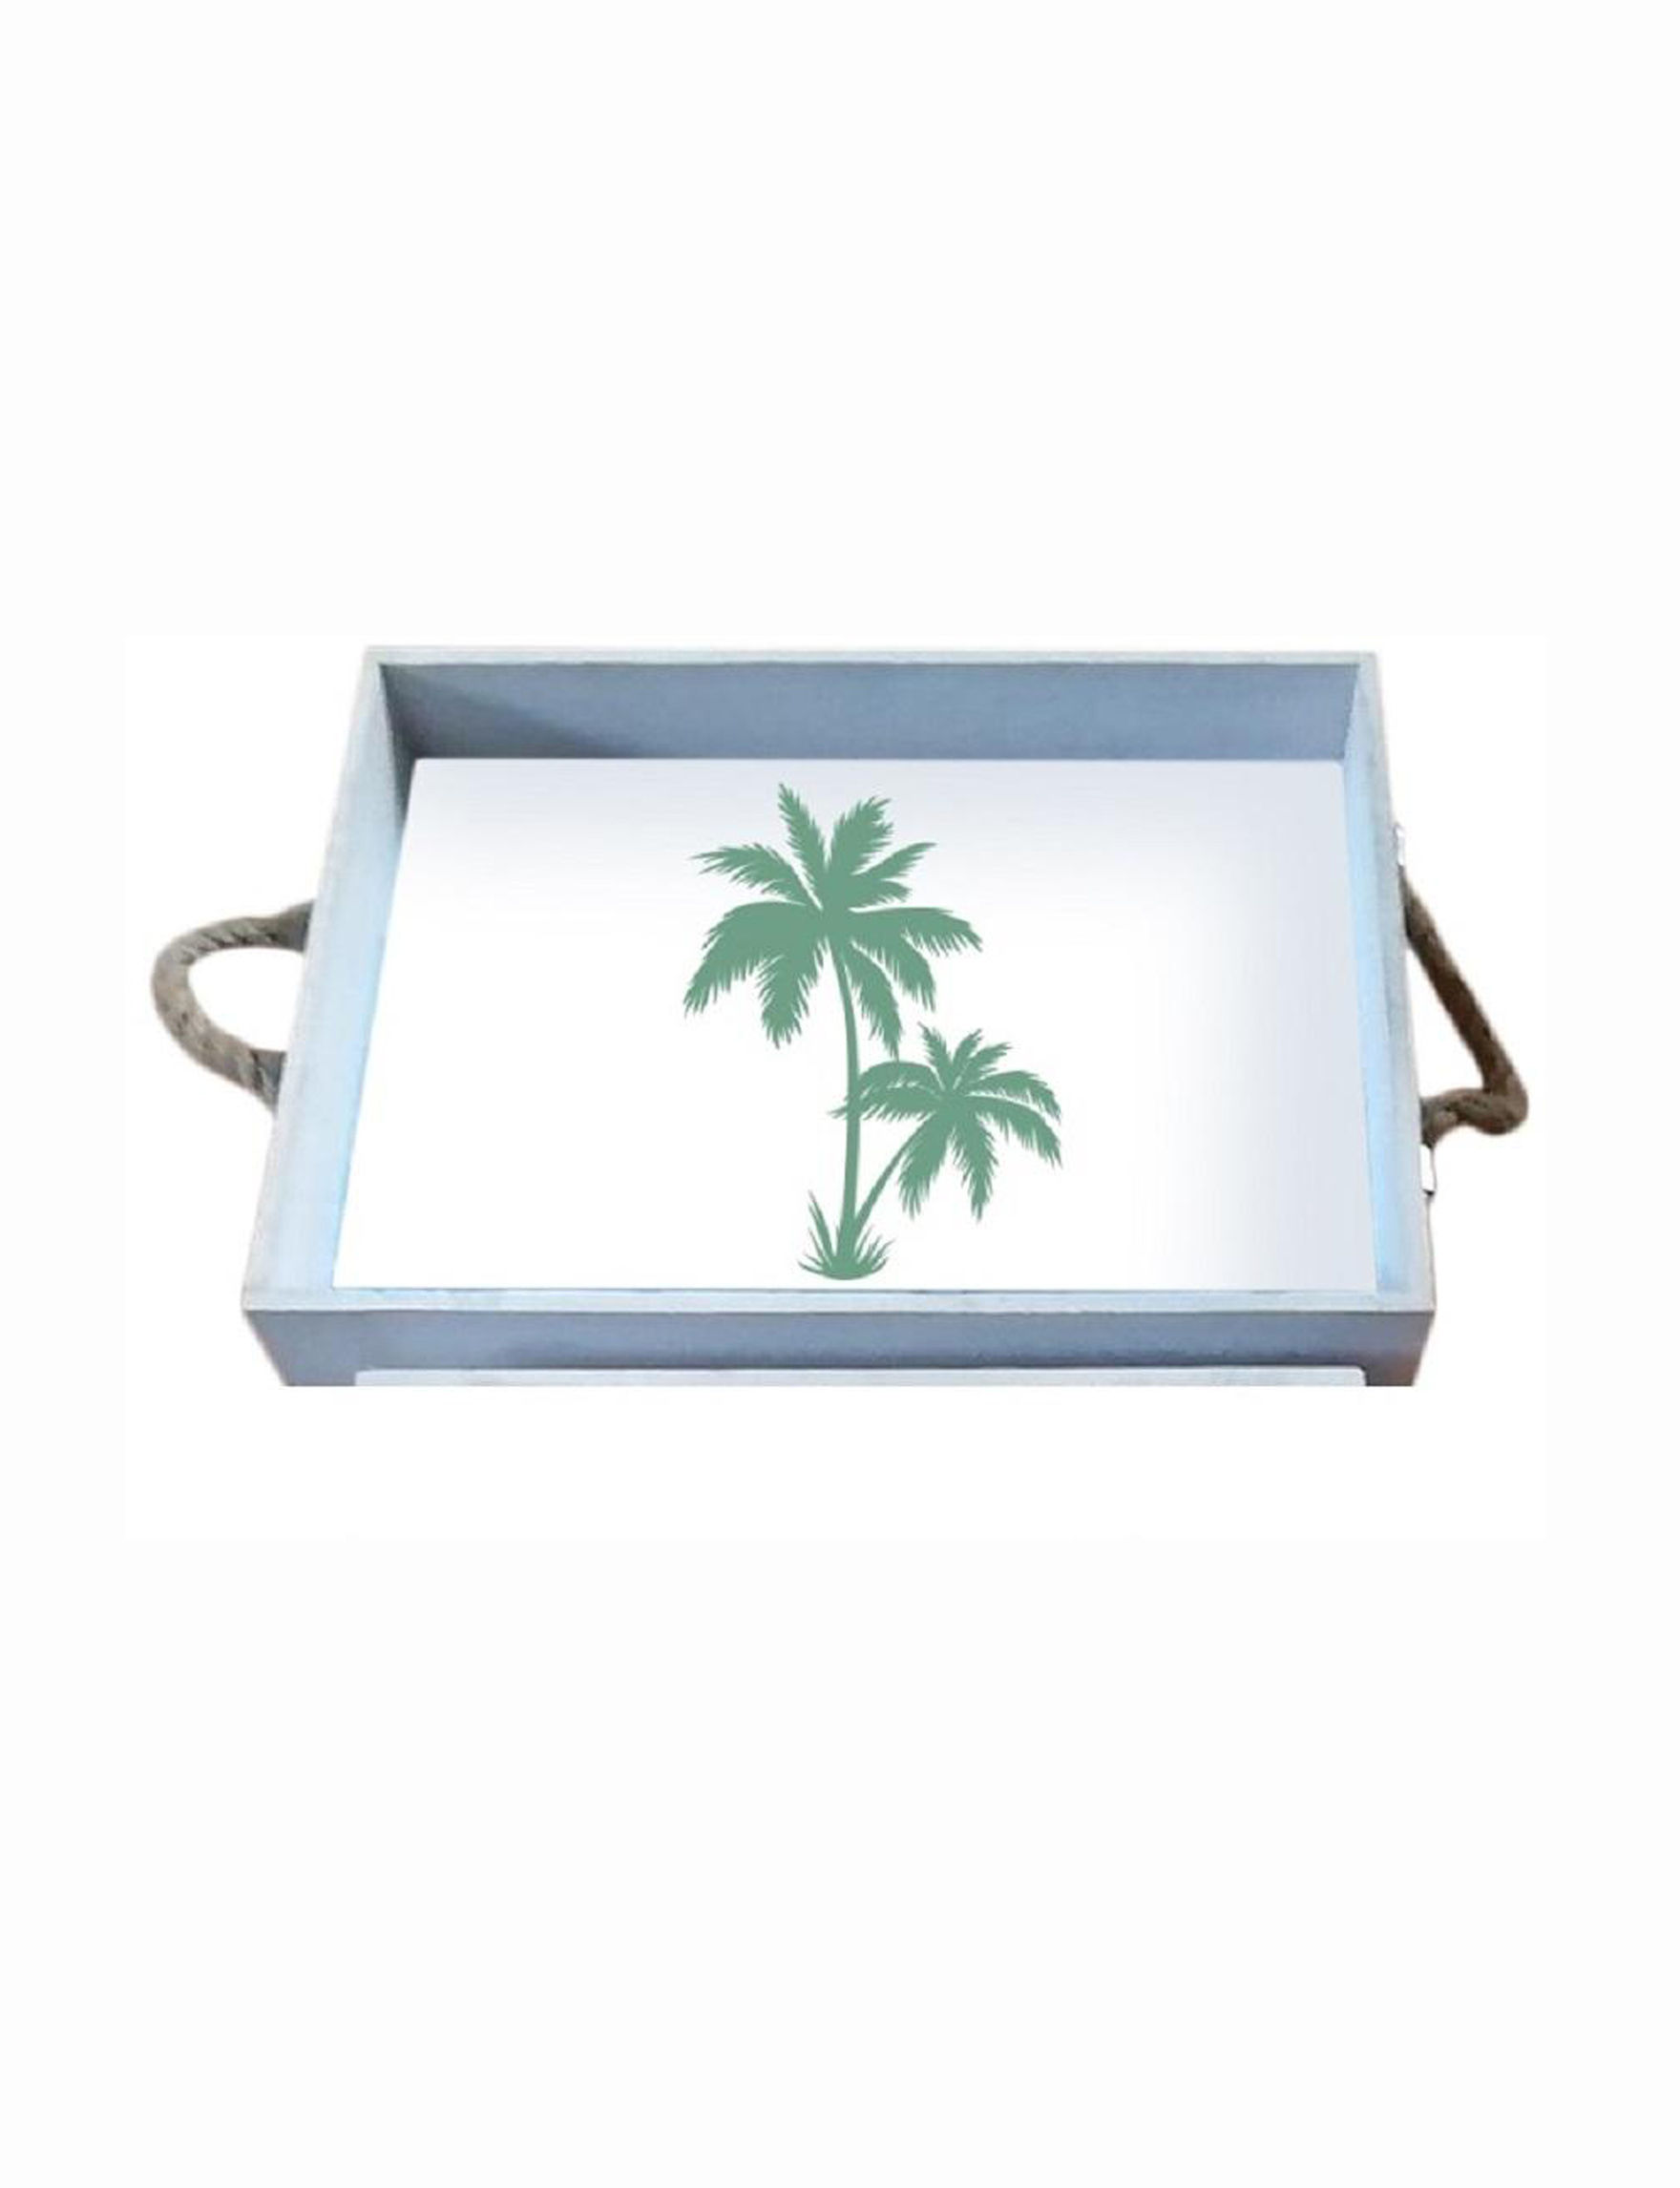 Fancy That Gift White / Green Decorative Trays Serveware